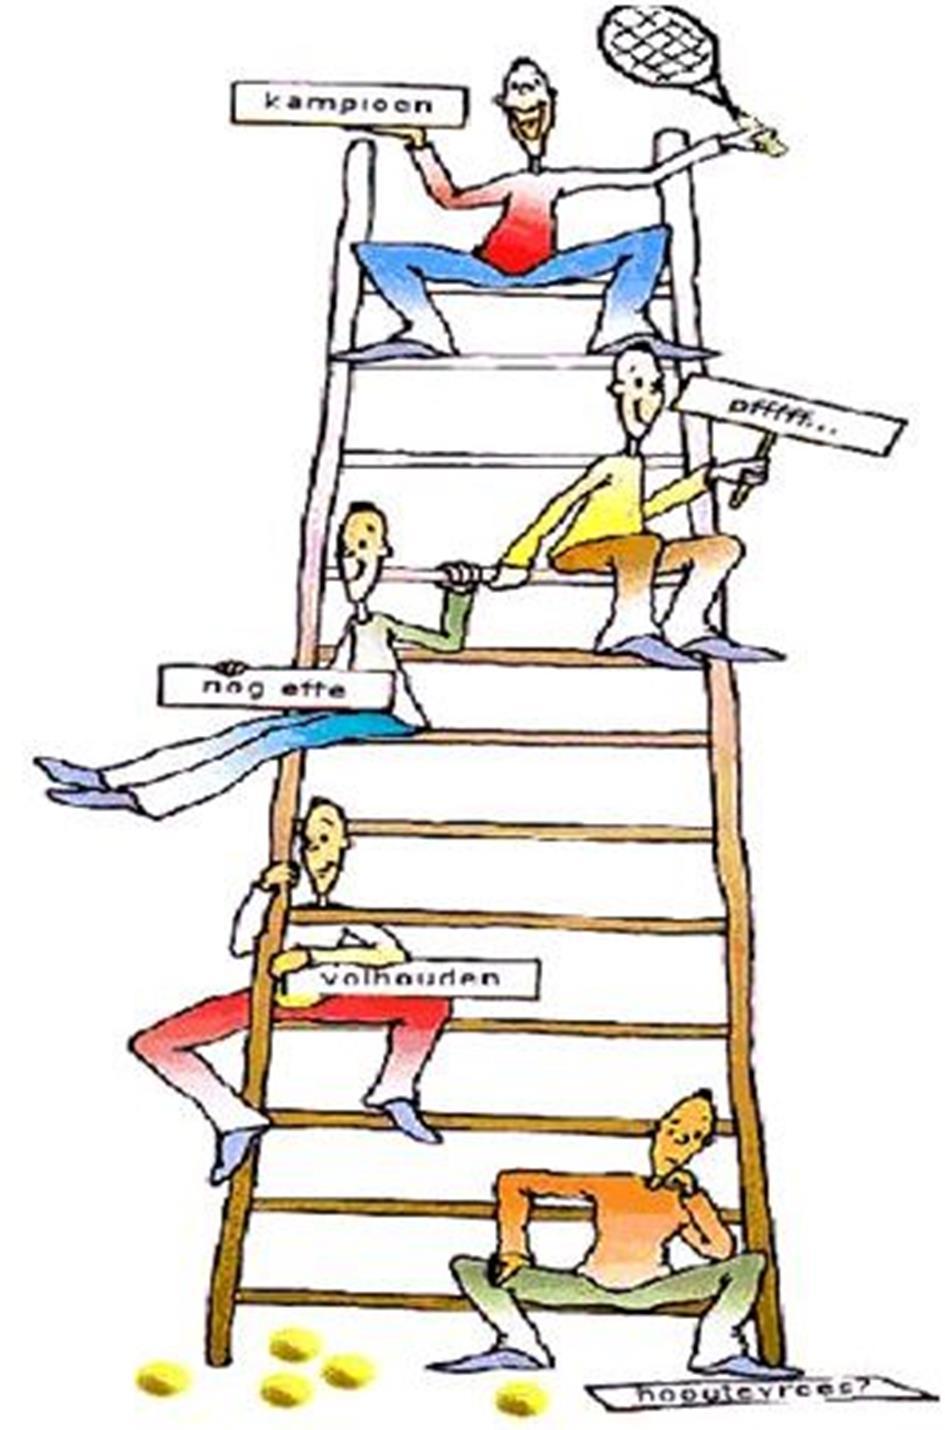 ladder-afbeelding-.jpg